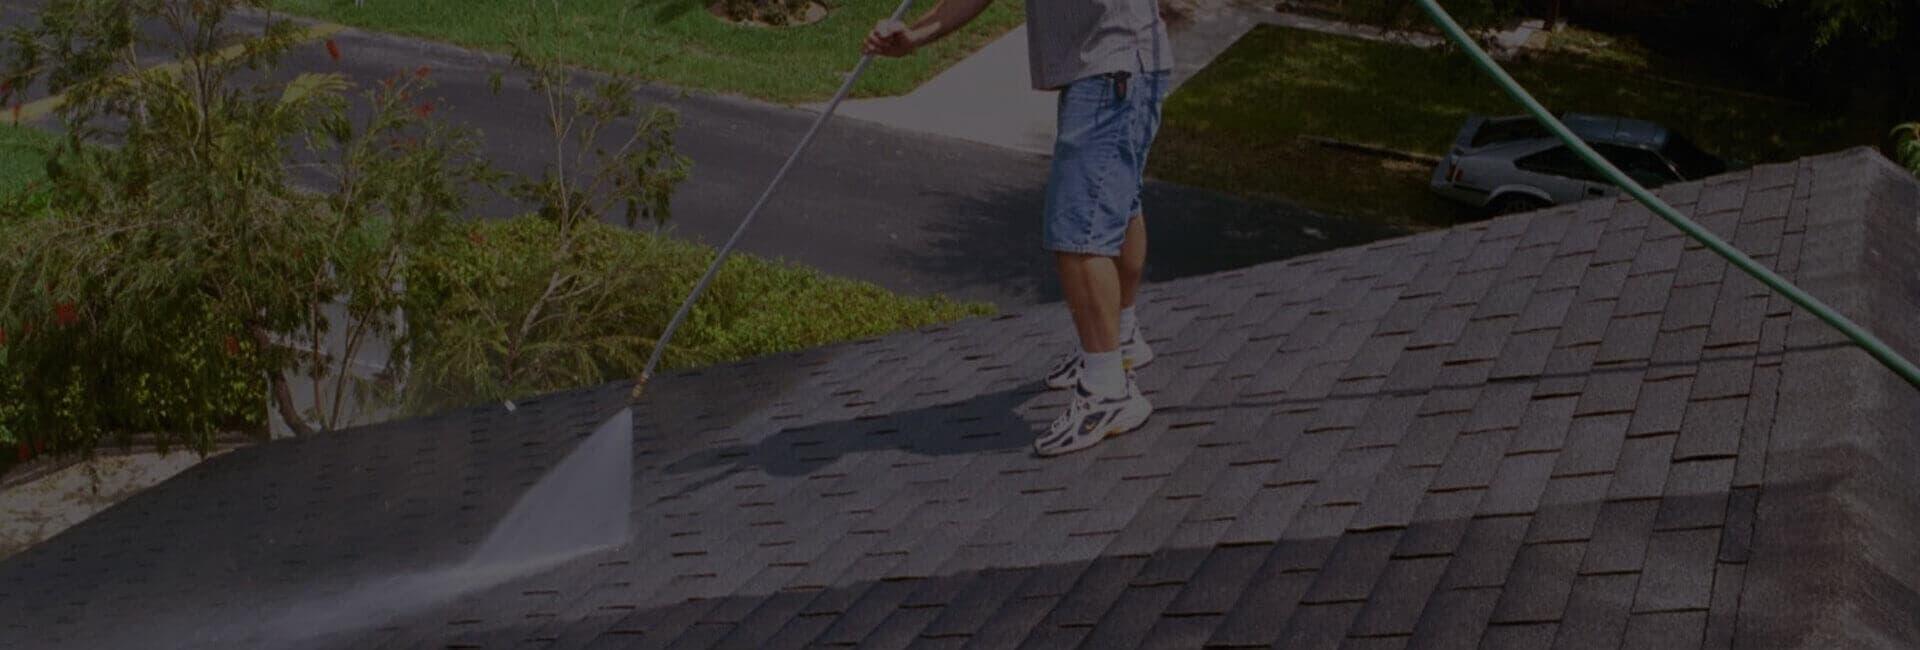 Roof Washing